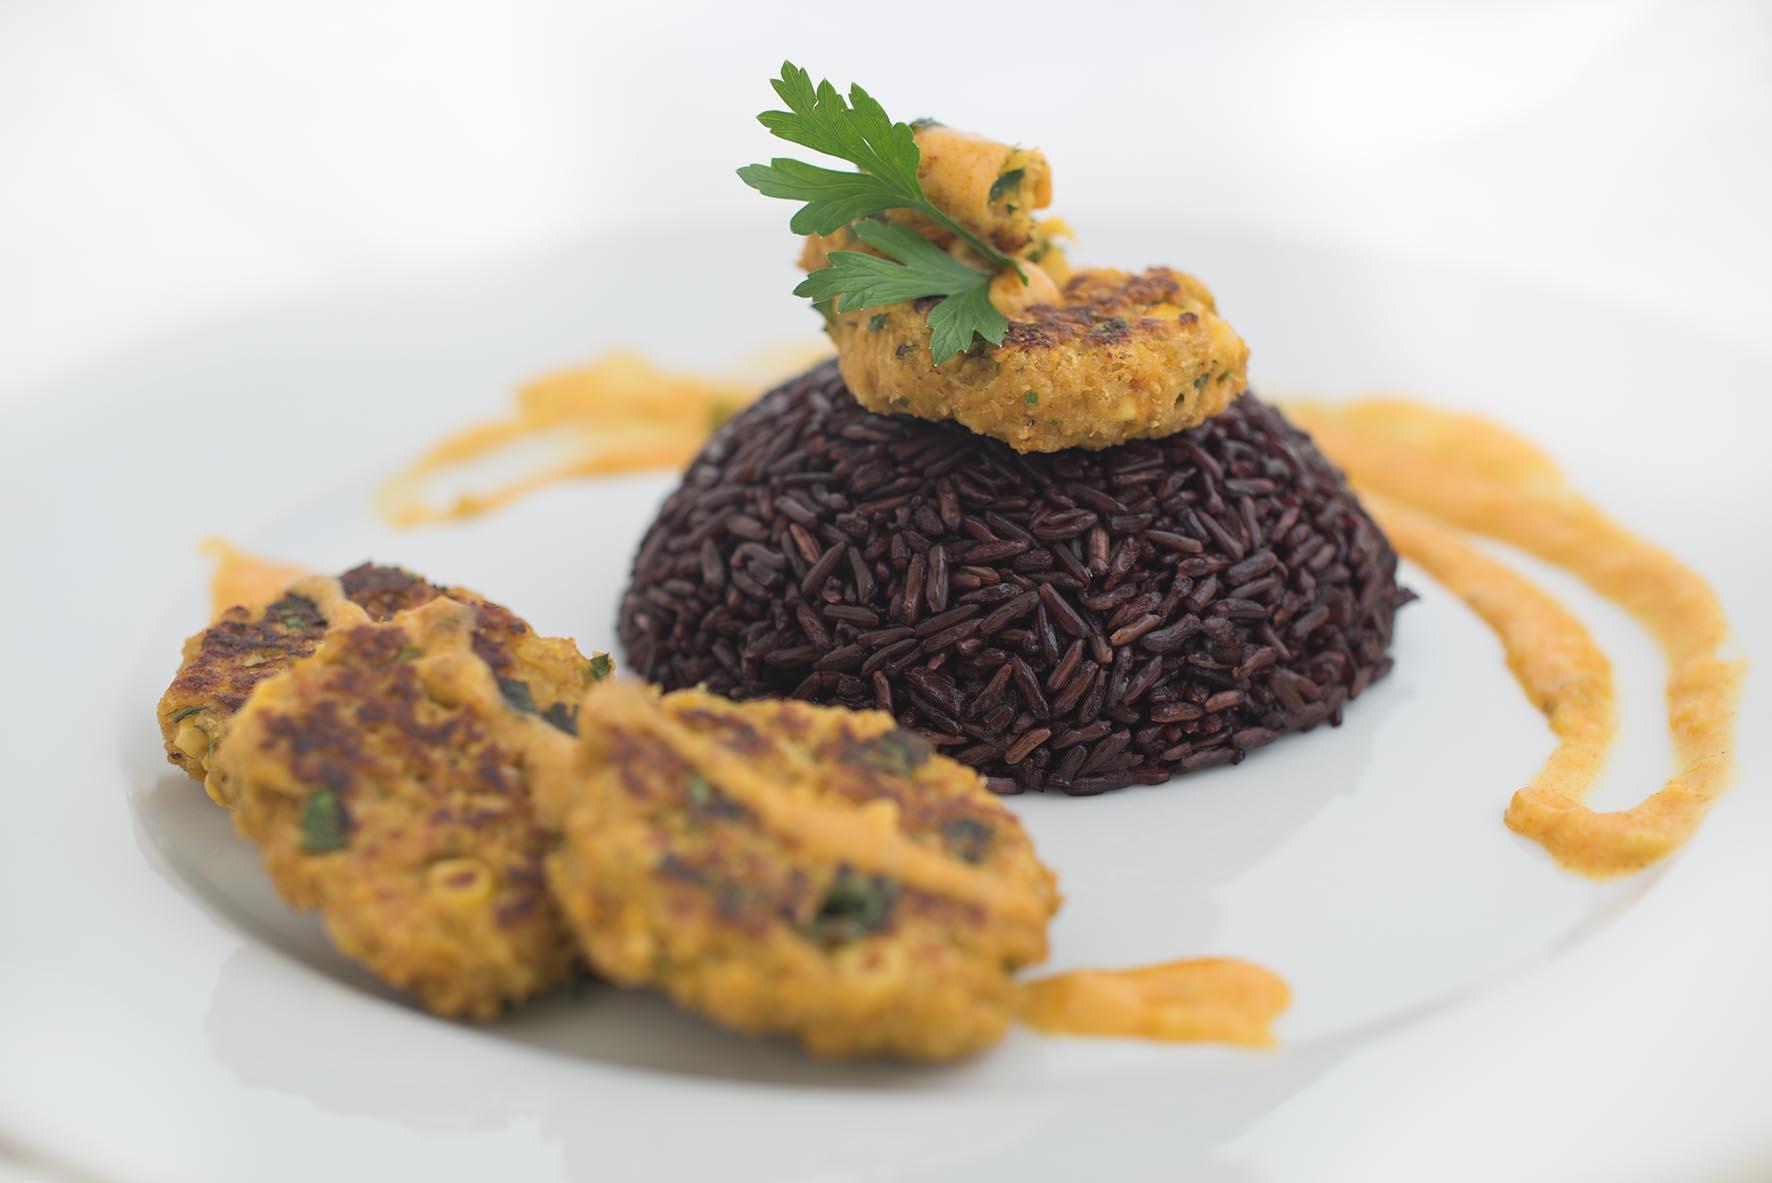 Veggie-balls-with-coconut-turmeric-sauce-recipe-main-dishes